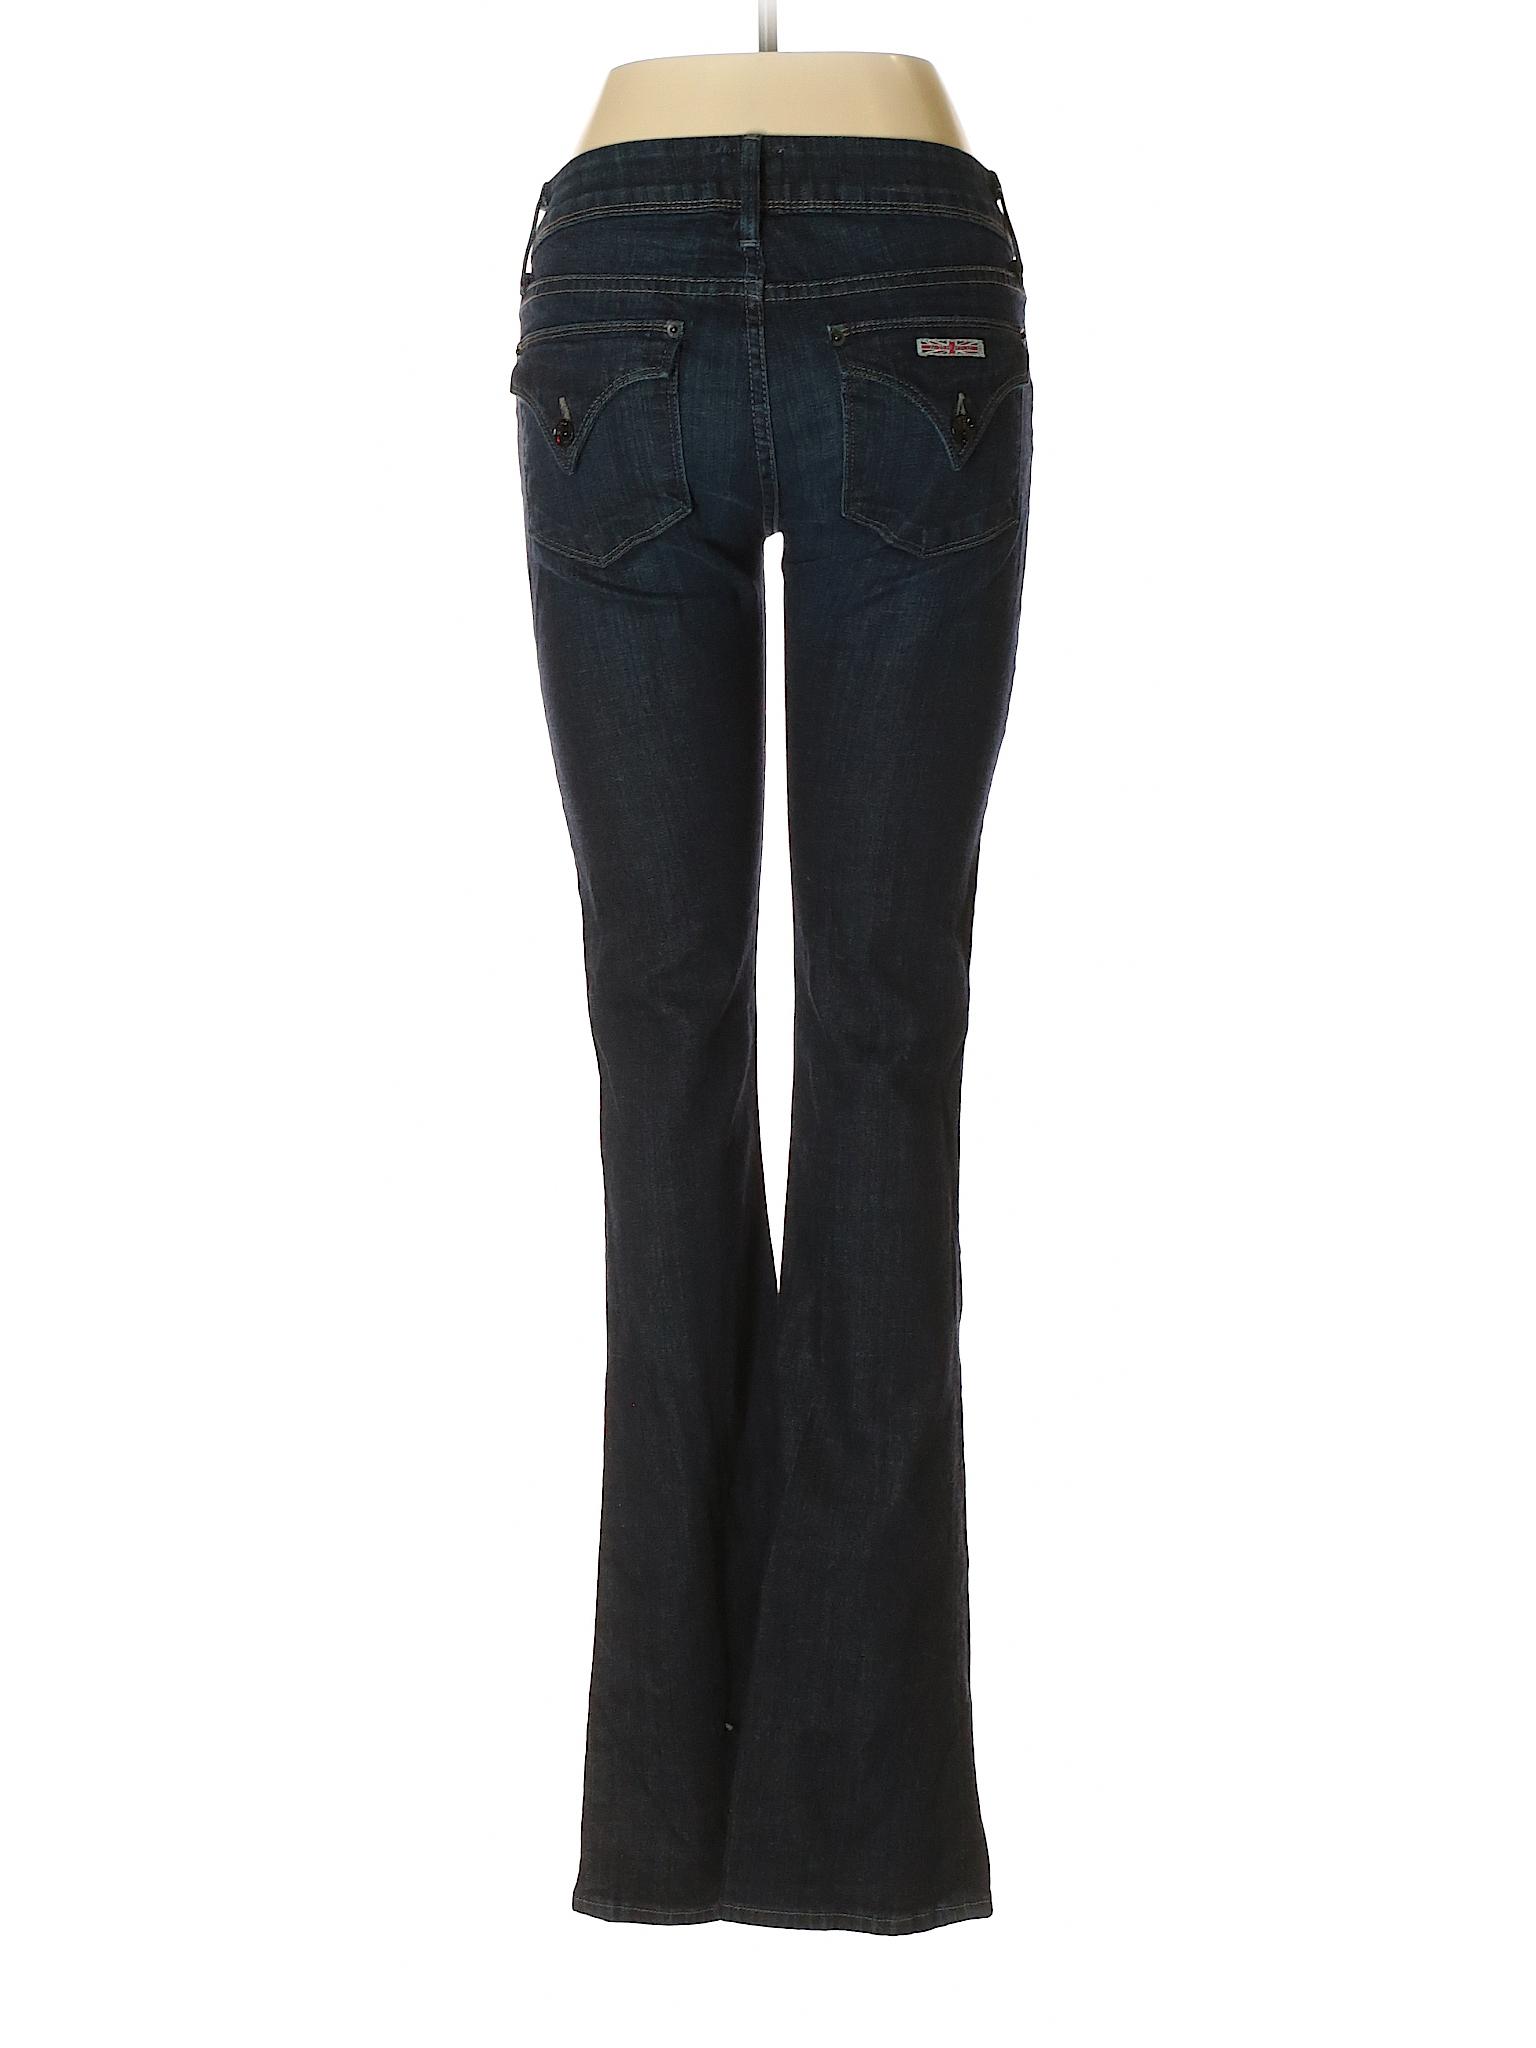 Promotion Promotion Hudson Hudson Jeans rHUqrxY8